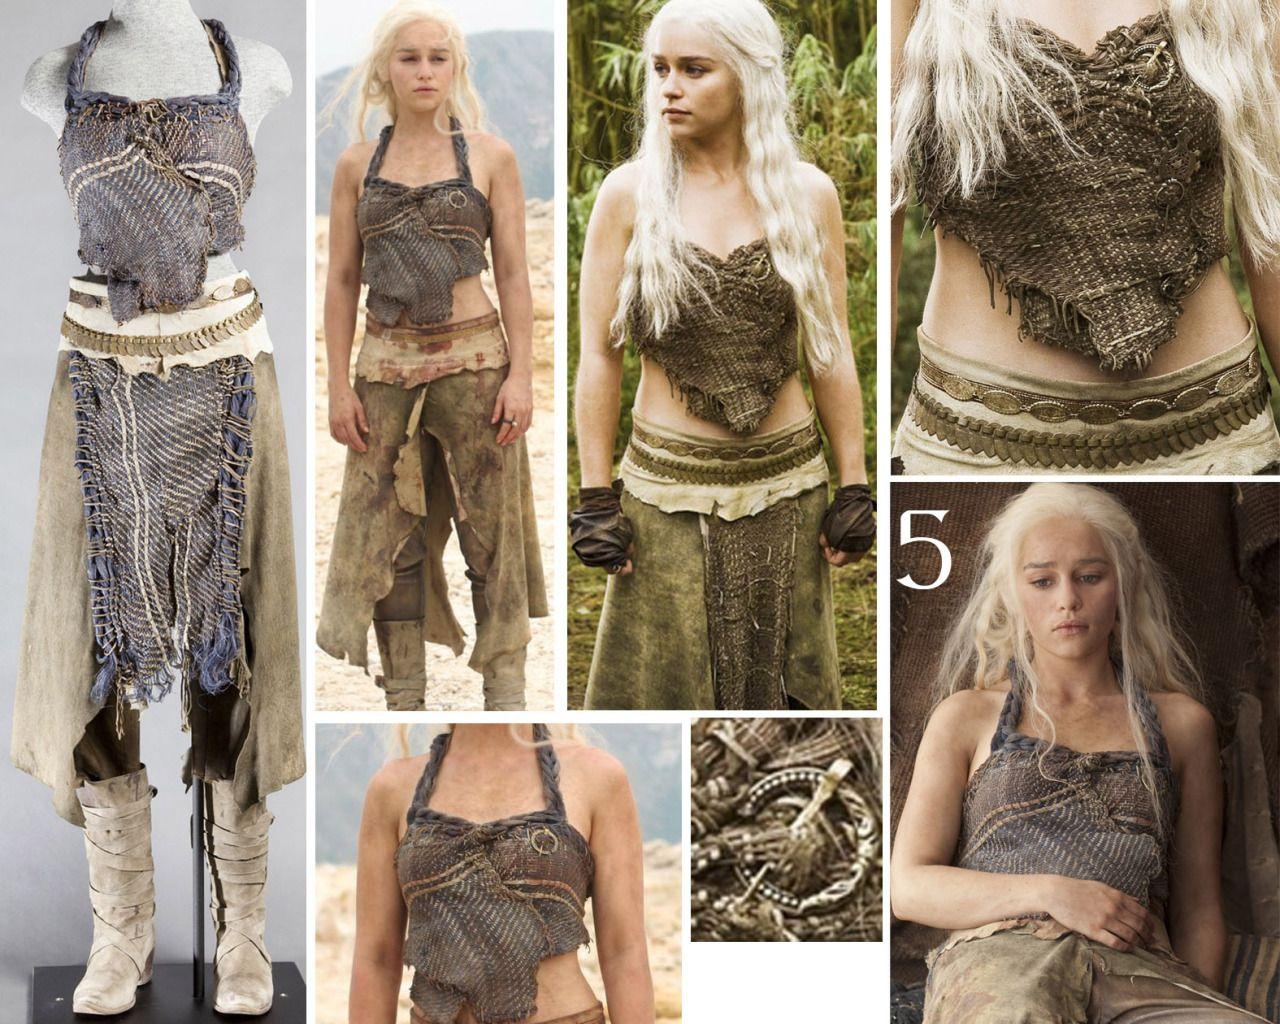 Daenerys targaryen cosplay cosplay pinterest for Daenerys targaryen costume tutorial